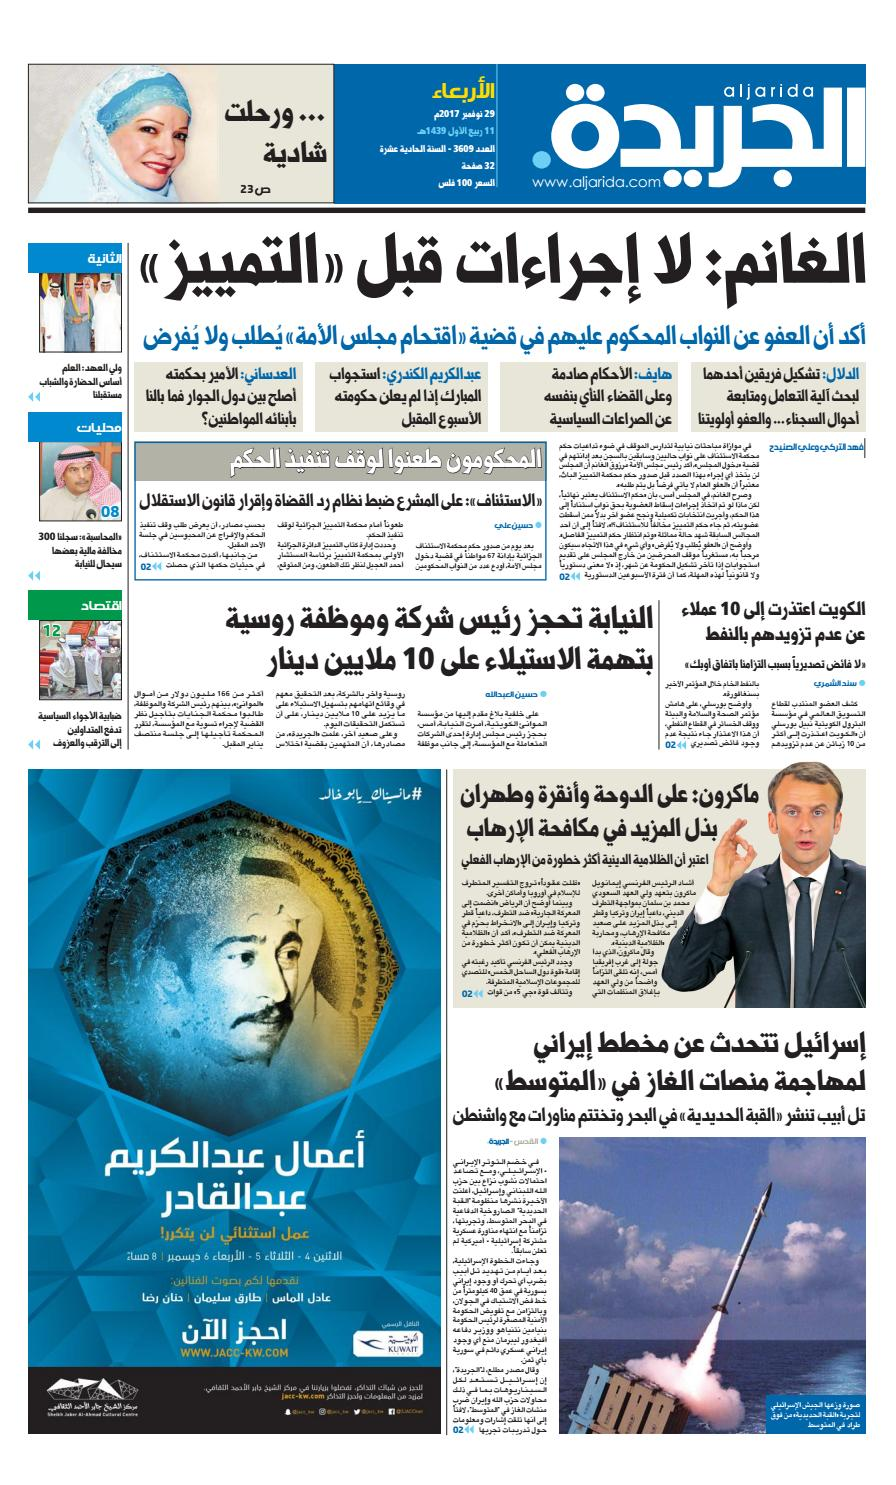 9f99dbb17f8e4 عدد الجريدة الأربعاء 29 نوفمبر 2017 by Aljarida Newspaper - issuu